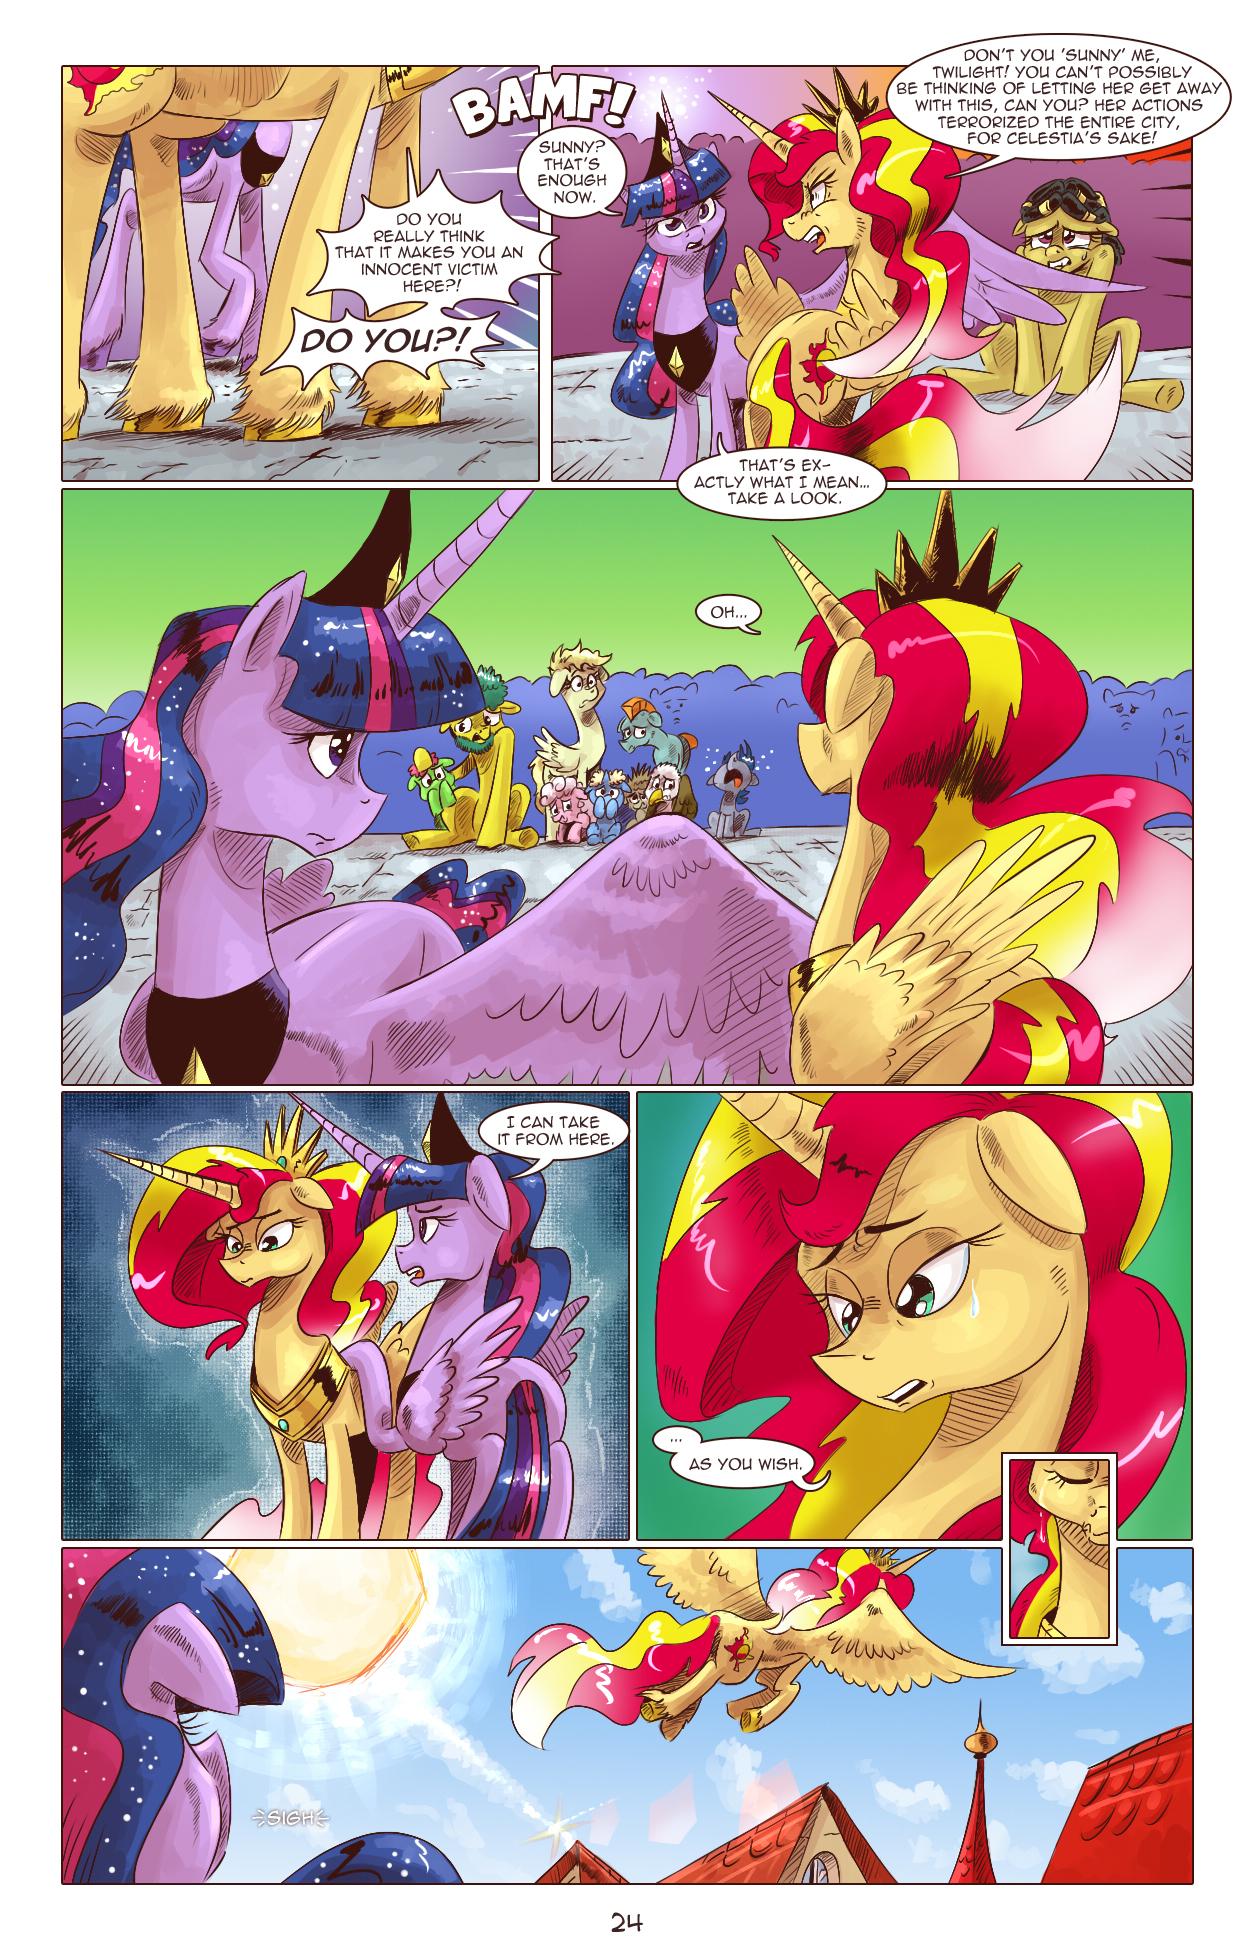 A Princess Worth Page 24